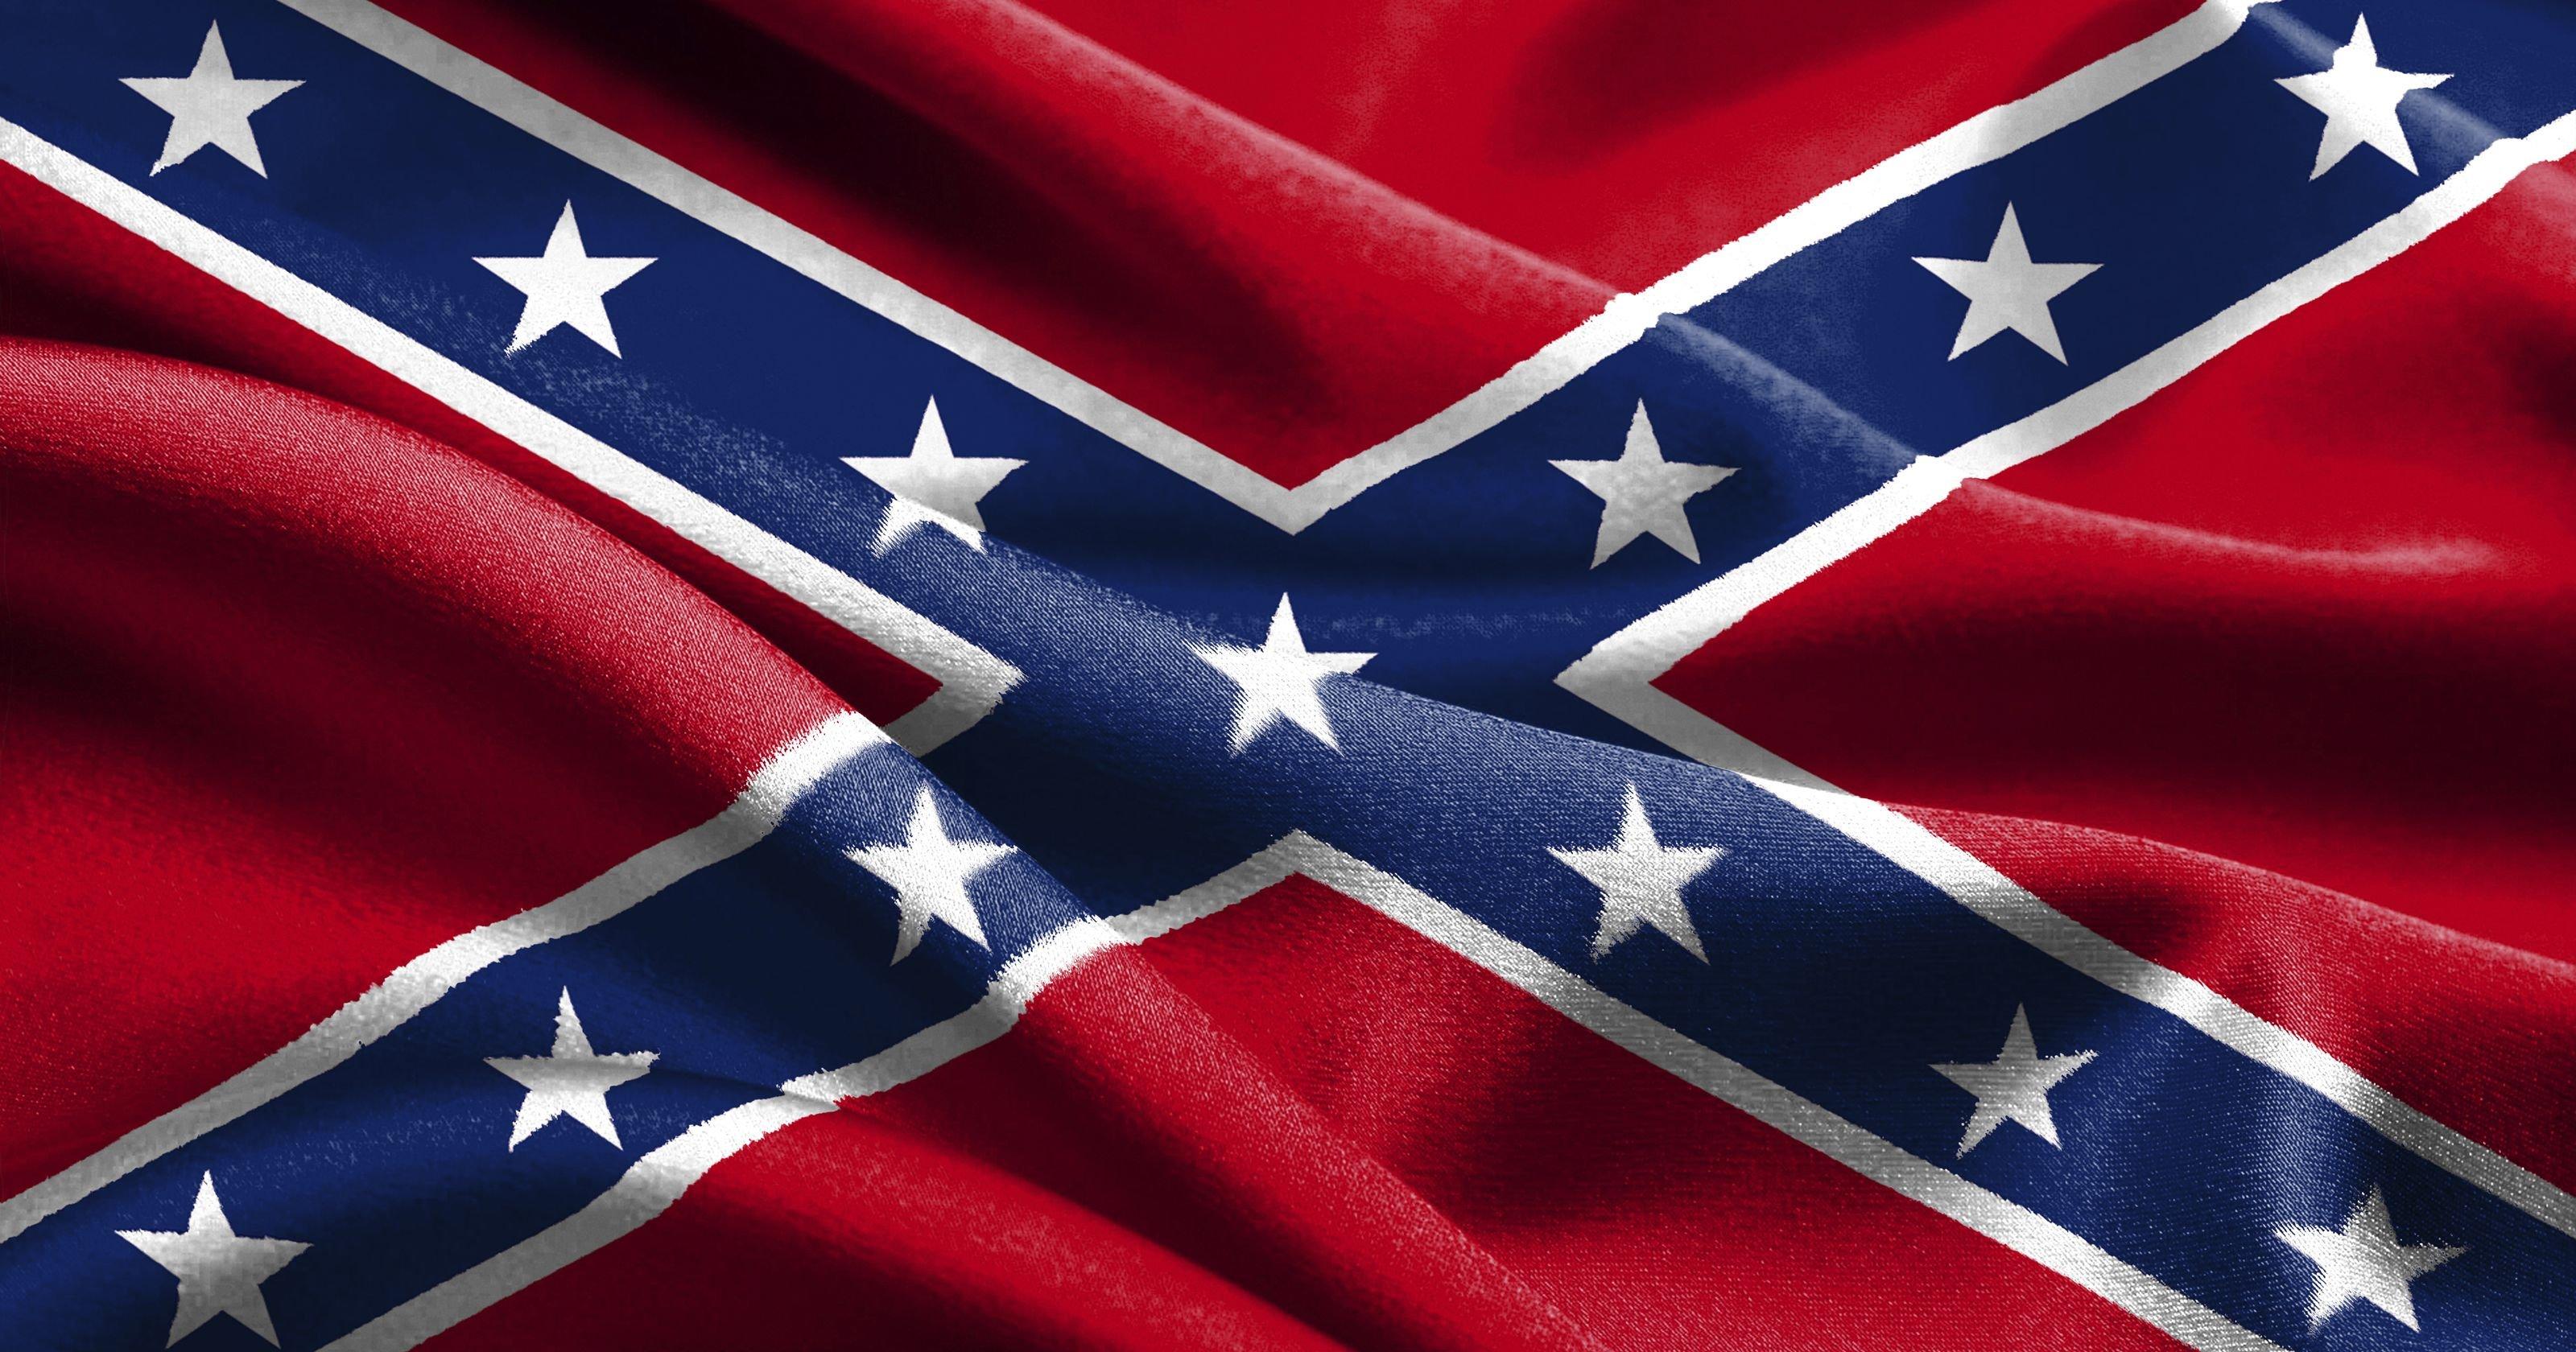 confederate flag usa america united states csa civil war rebel dixie